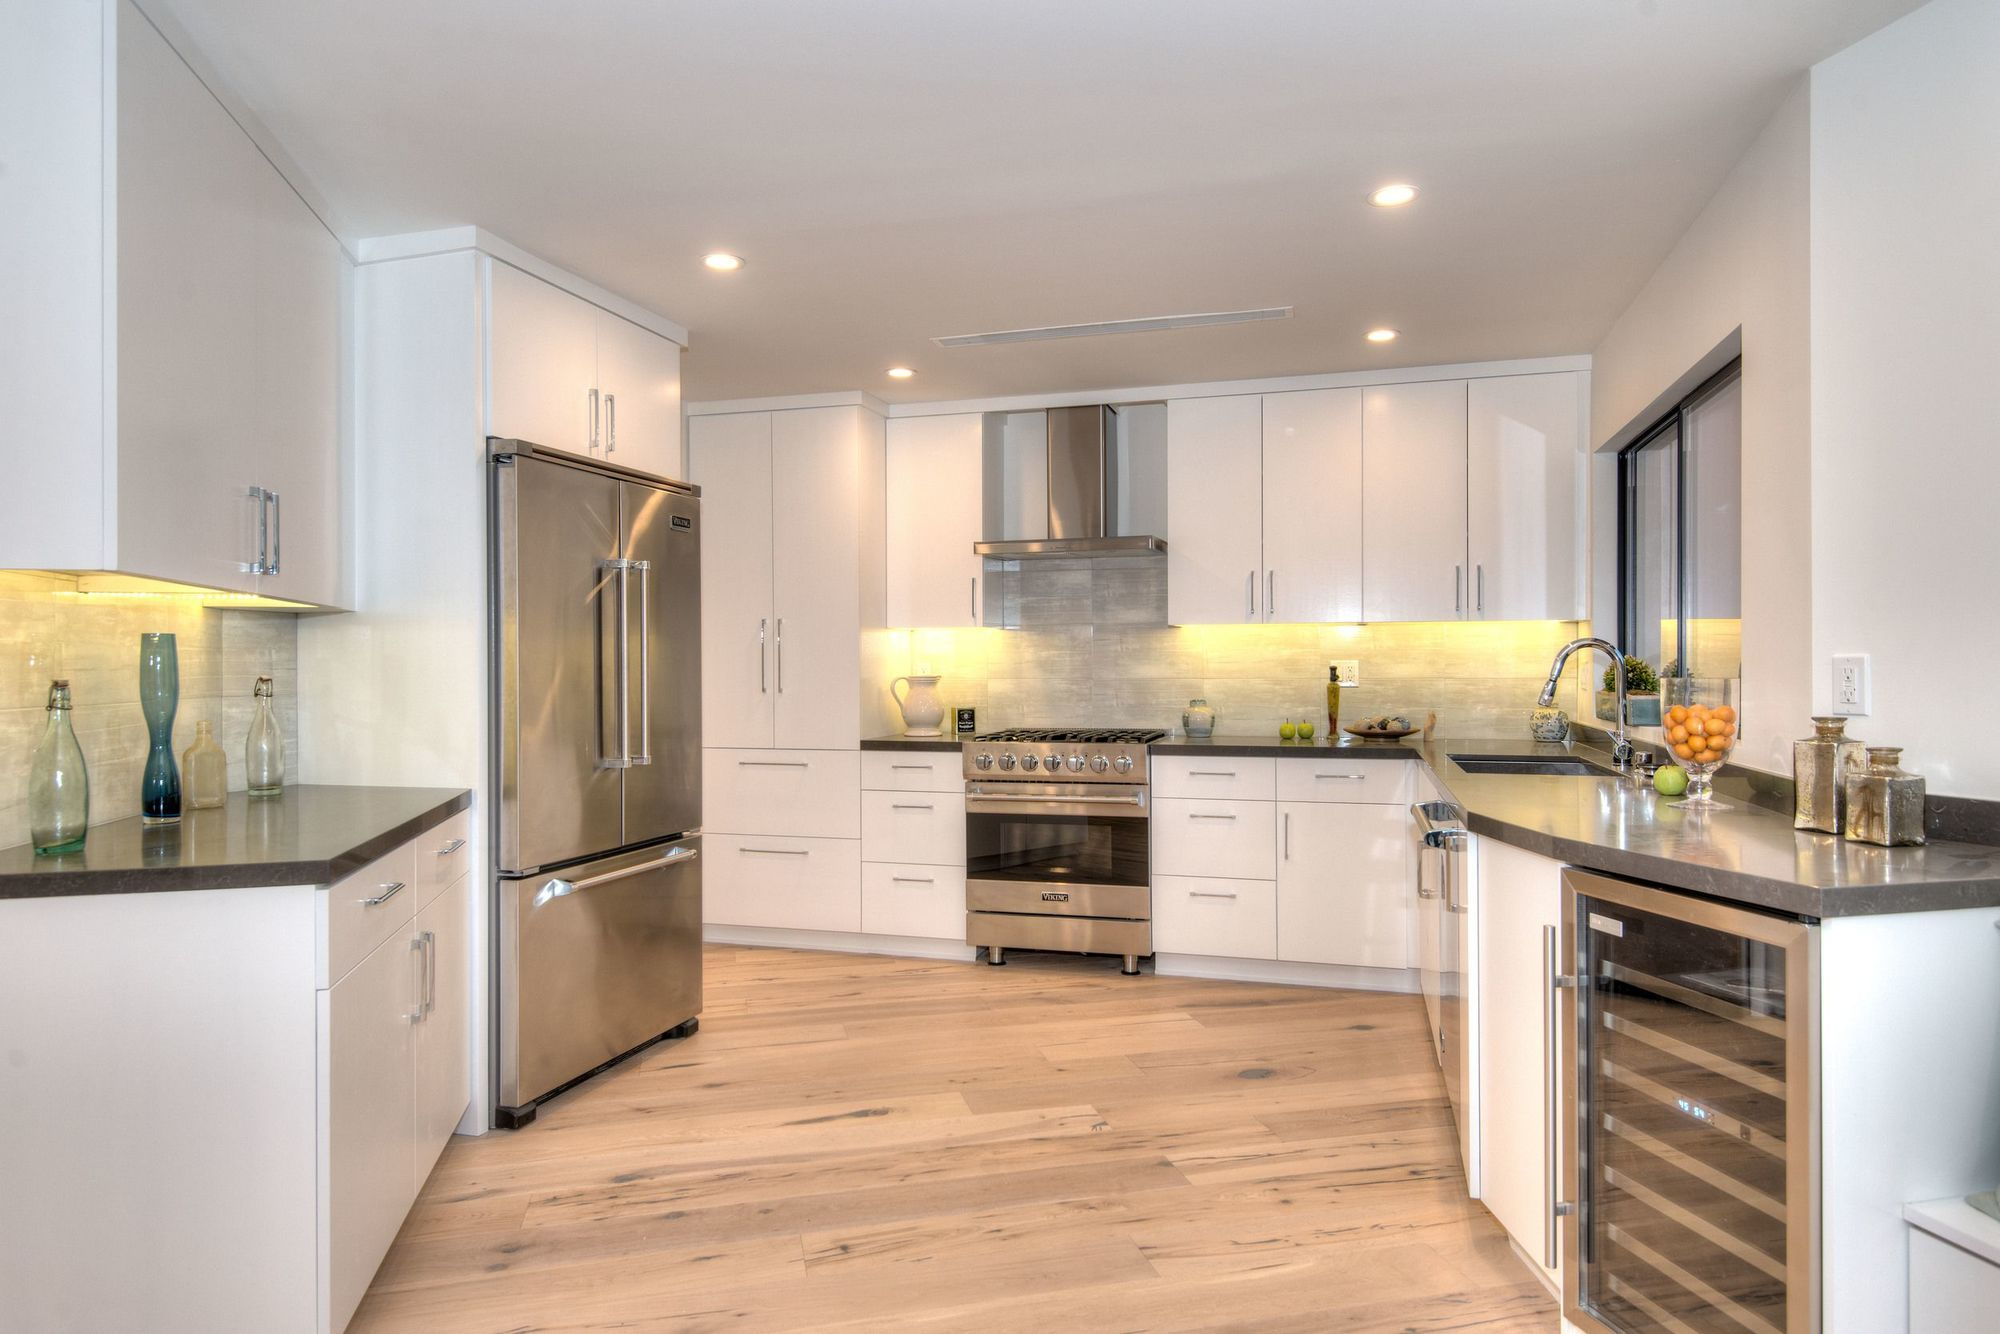 Kitchen remodel cost break down i e cabinets for Average cost to redo kitchen cabinets